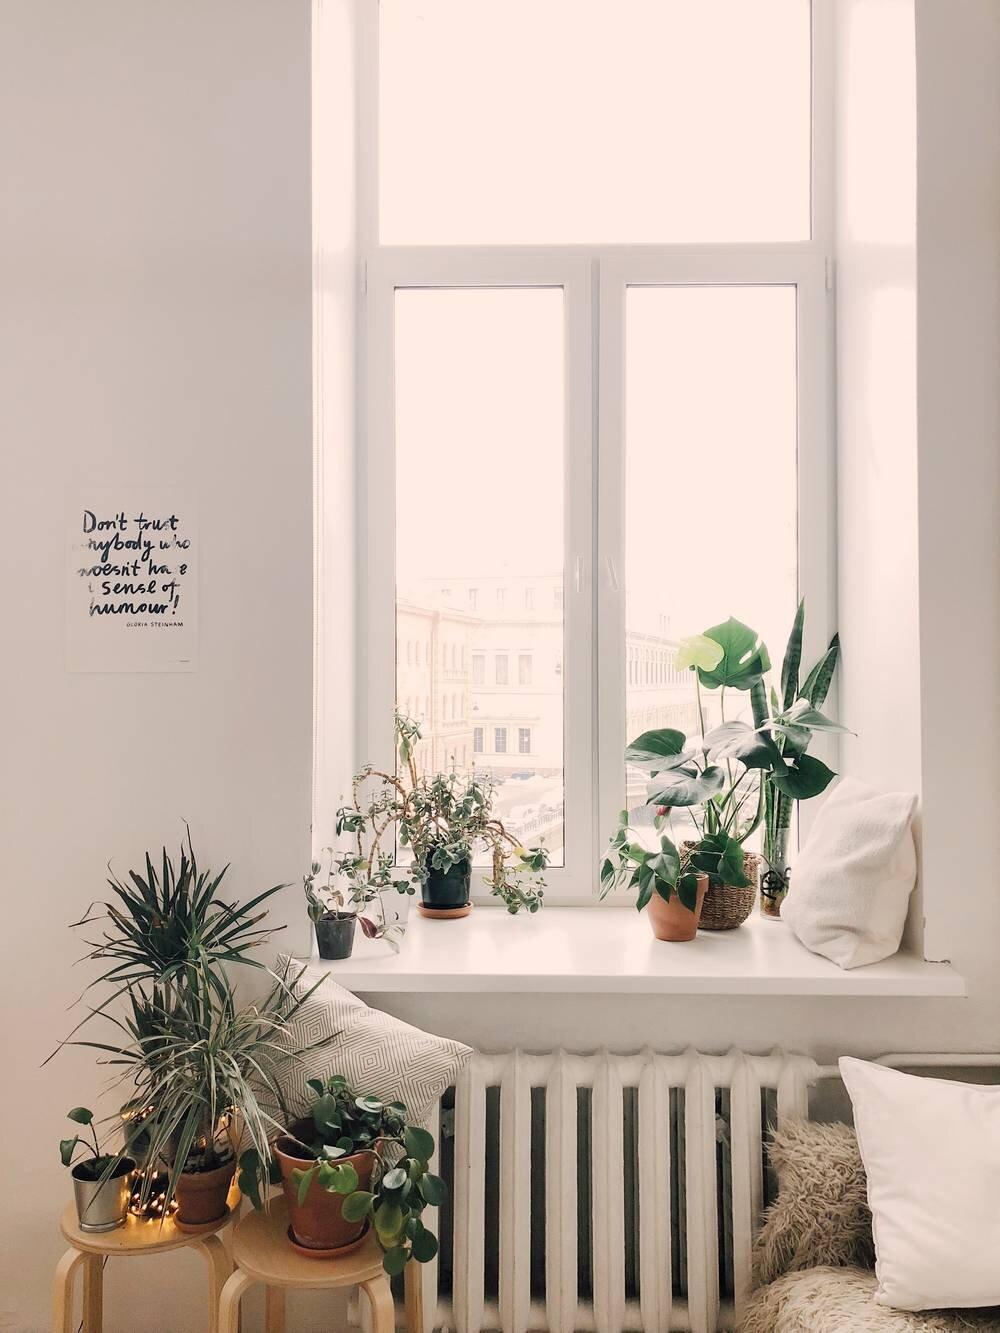 belliservice_airbnb_1k_001.jpg